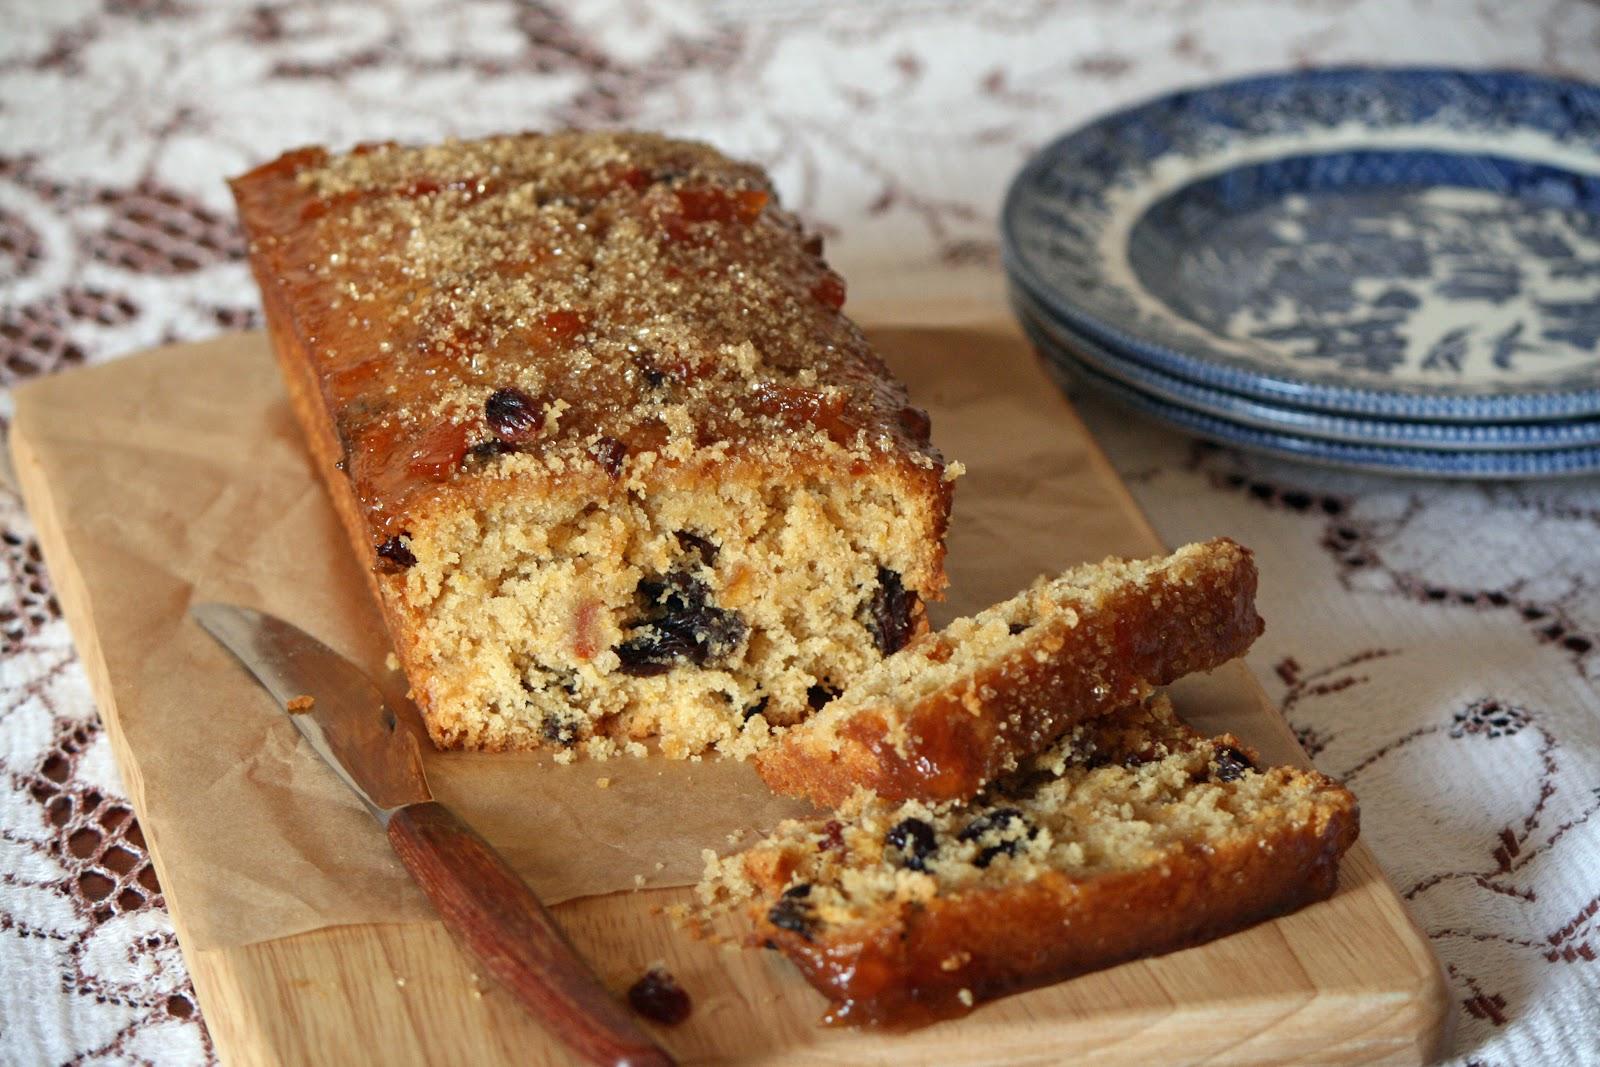 Lauralovescakes...: Marmalade Loaf Cake